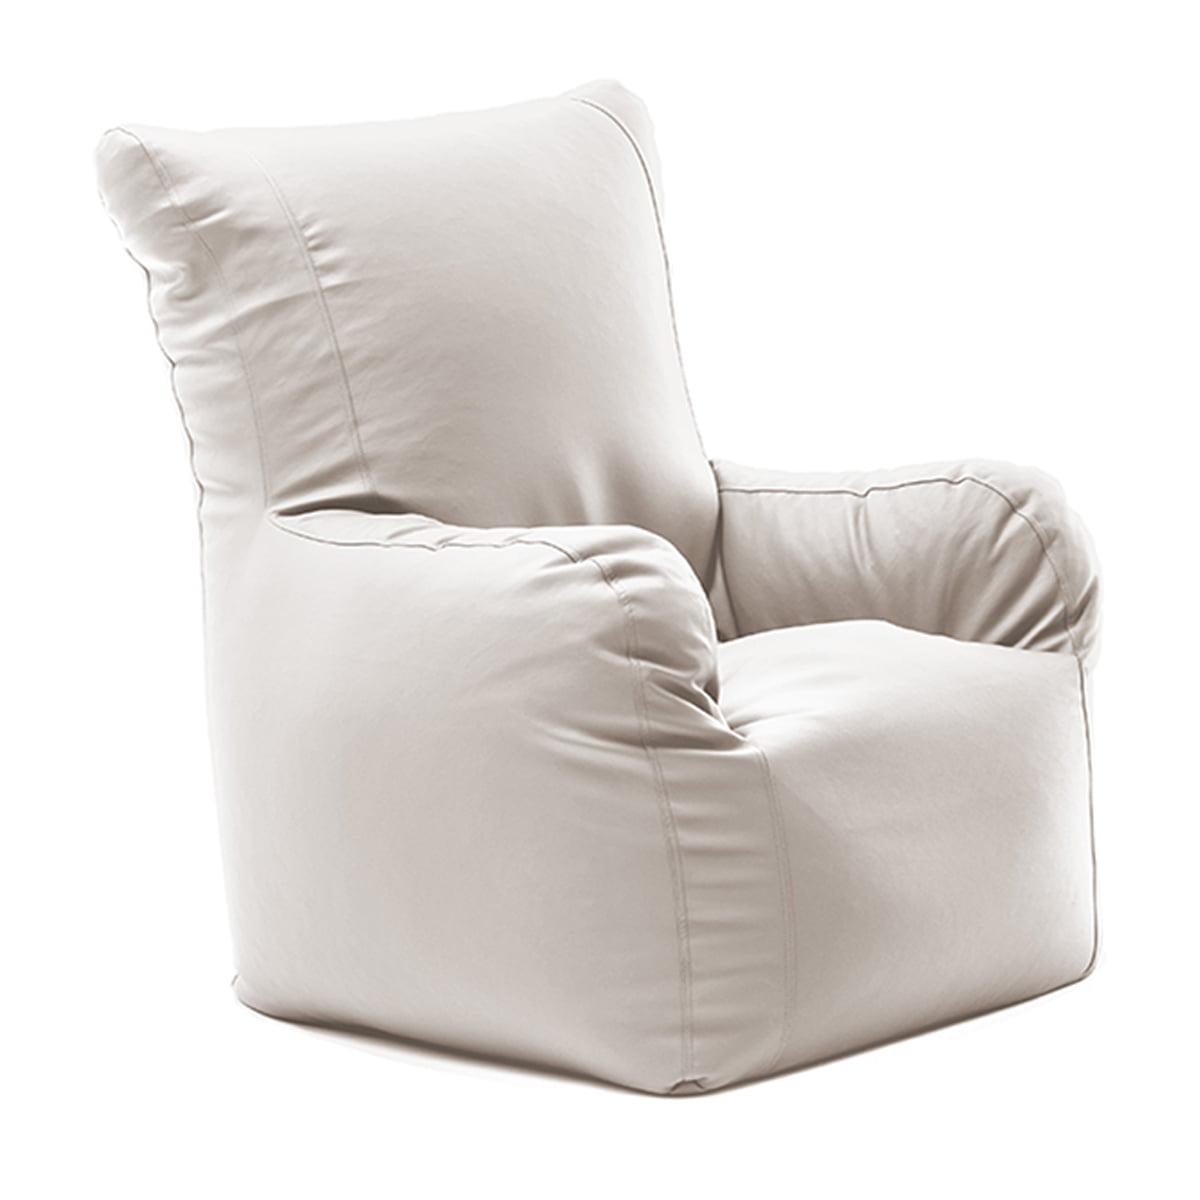 outdoor sessel von sitting bull im shop. Black Bedroom Furniture Sets. Home Design Ideas